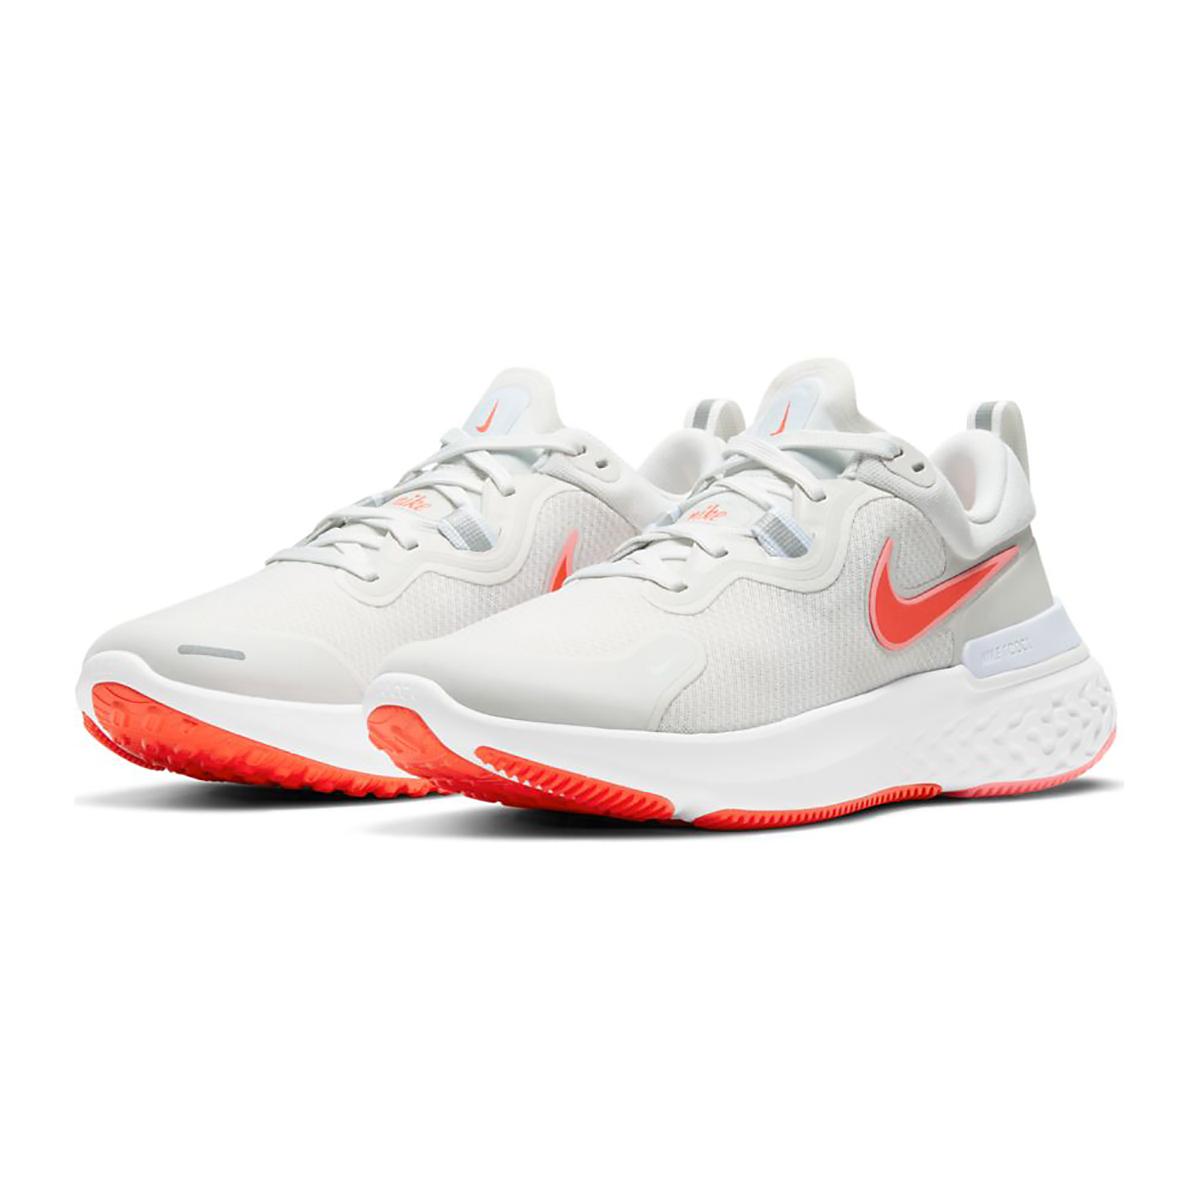 Women's Nike React Miler Running Shoe - Color: Platinum Tint/Bright Chrimson - Size: 5 - Width: Regular, Platinum Tint/Bright Chrimson, large, image 4